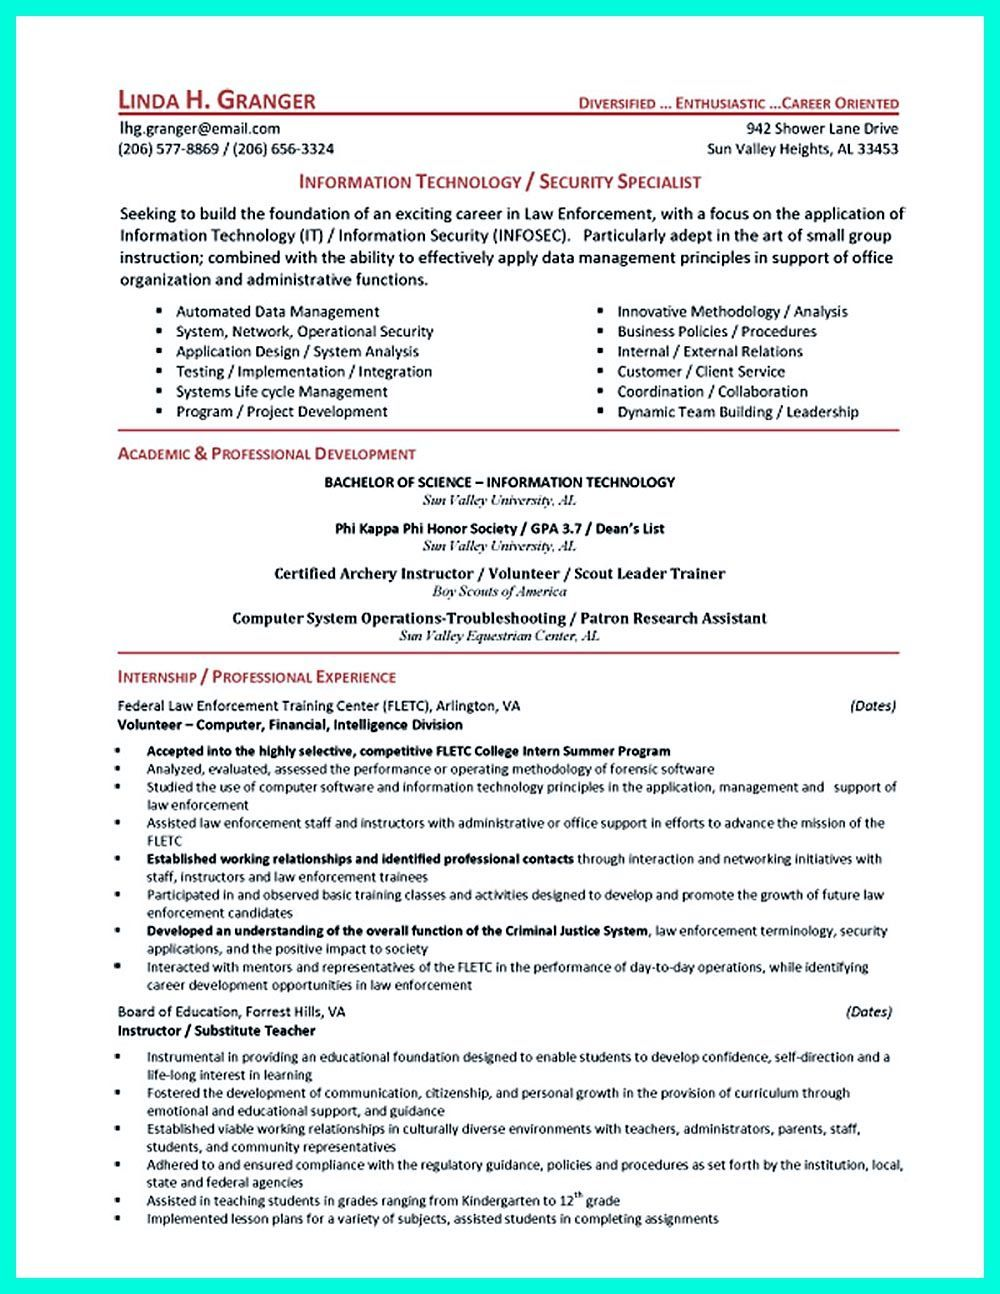 creativeresumetemplate Security resume